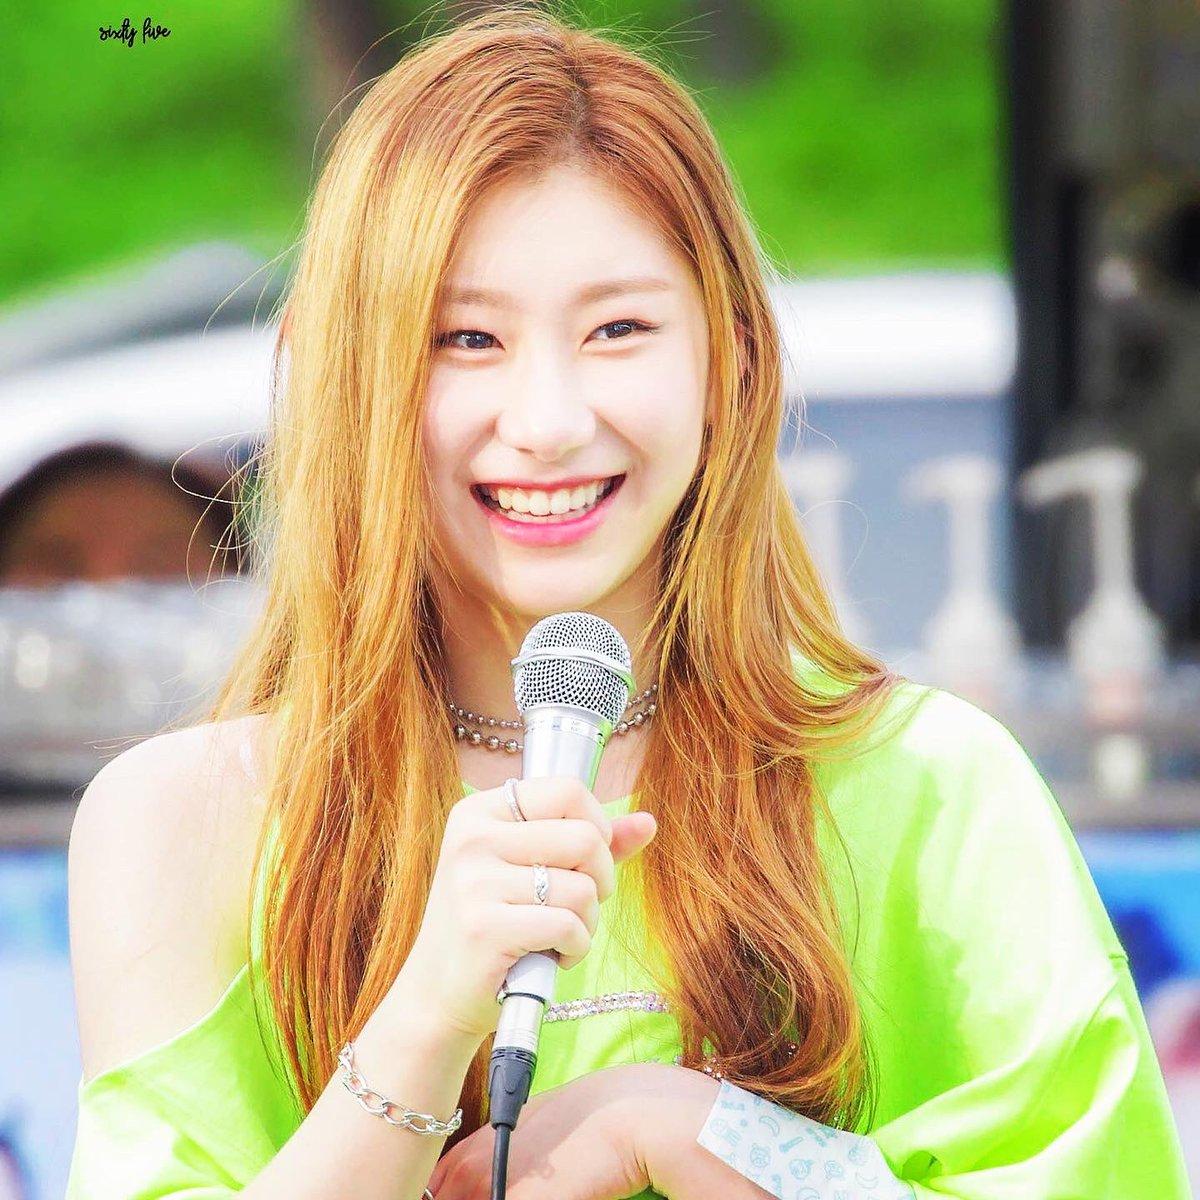 stanchaeryeong_3b